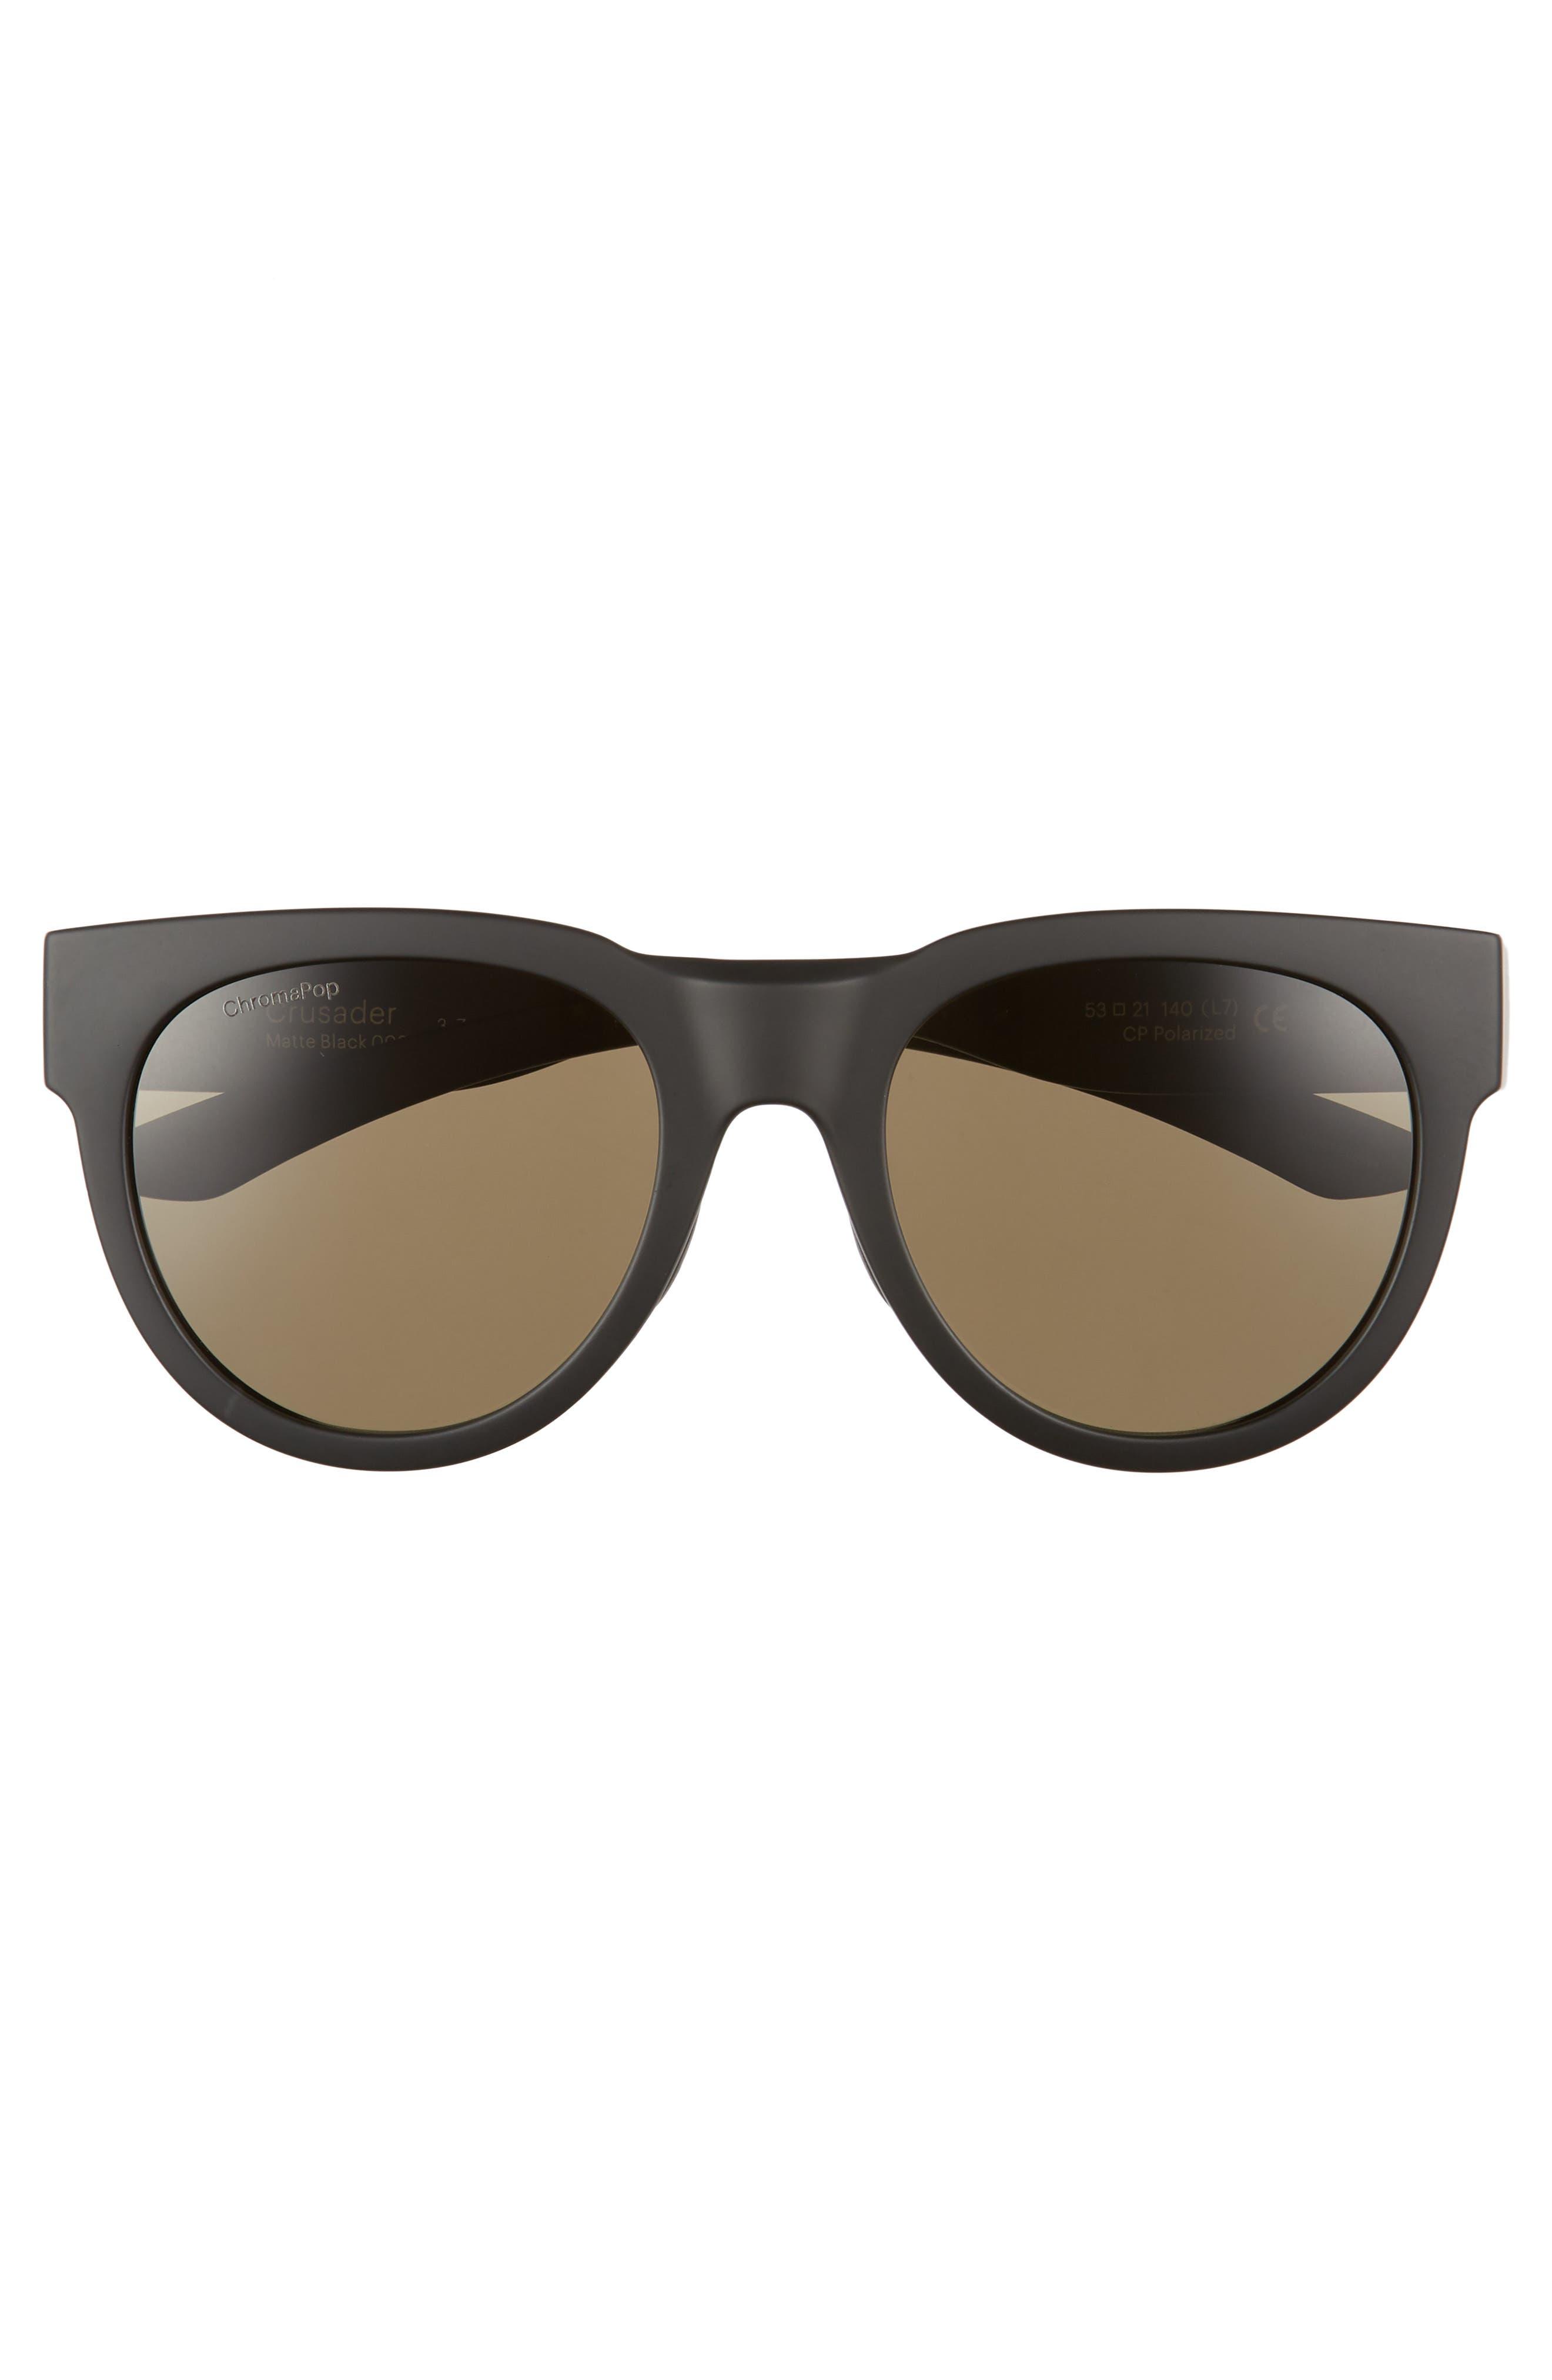 Crusader 53mm ChromaPop<sup>™</sup> Round Sunglasses,                             Alternate thumbnail 3, color,                             Matte Black